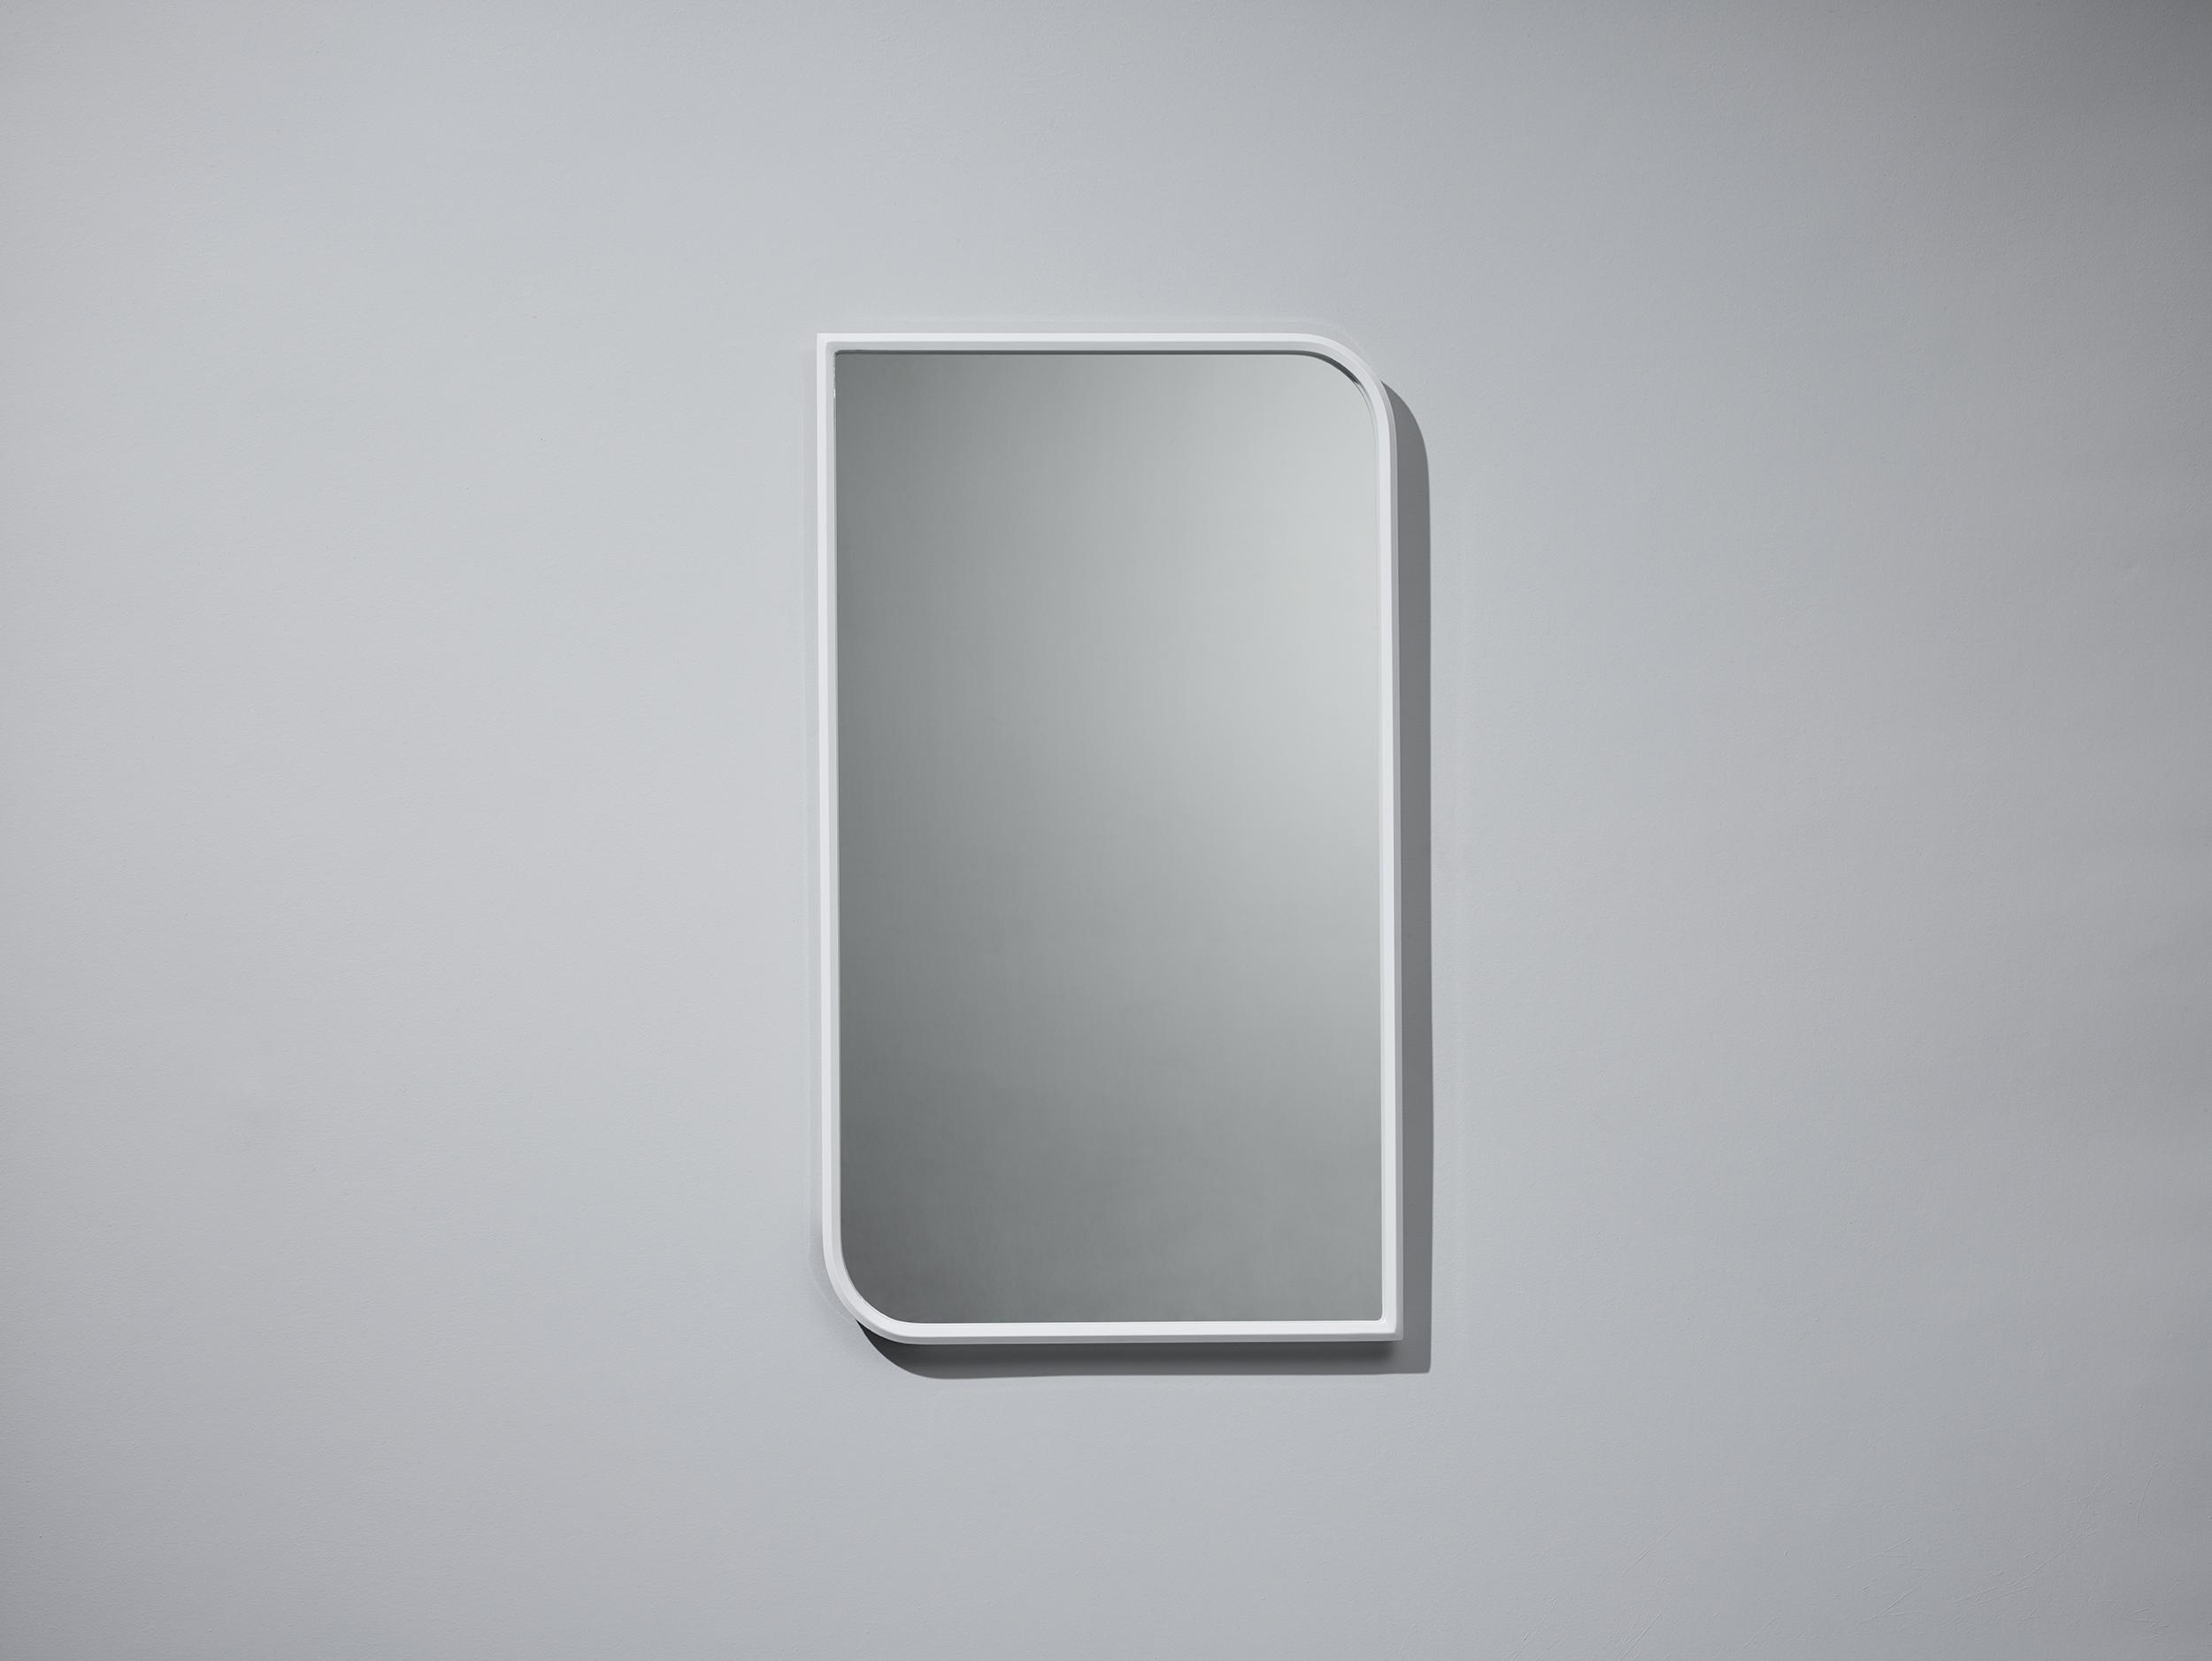 DoubleCurve_Mirror_Vertical_COMP_Oa_2500pxl.jpg